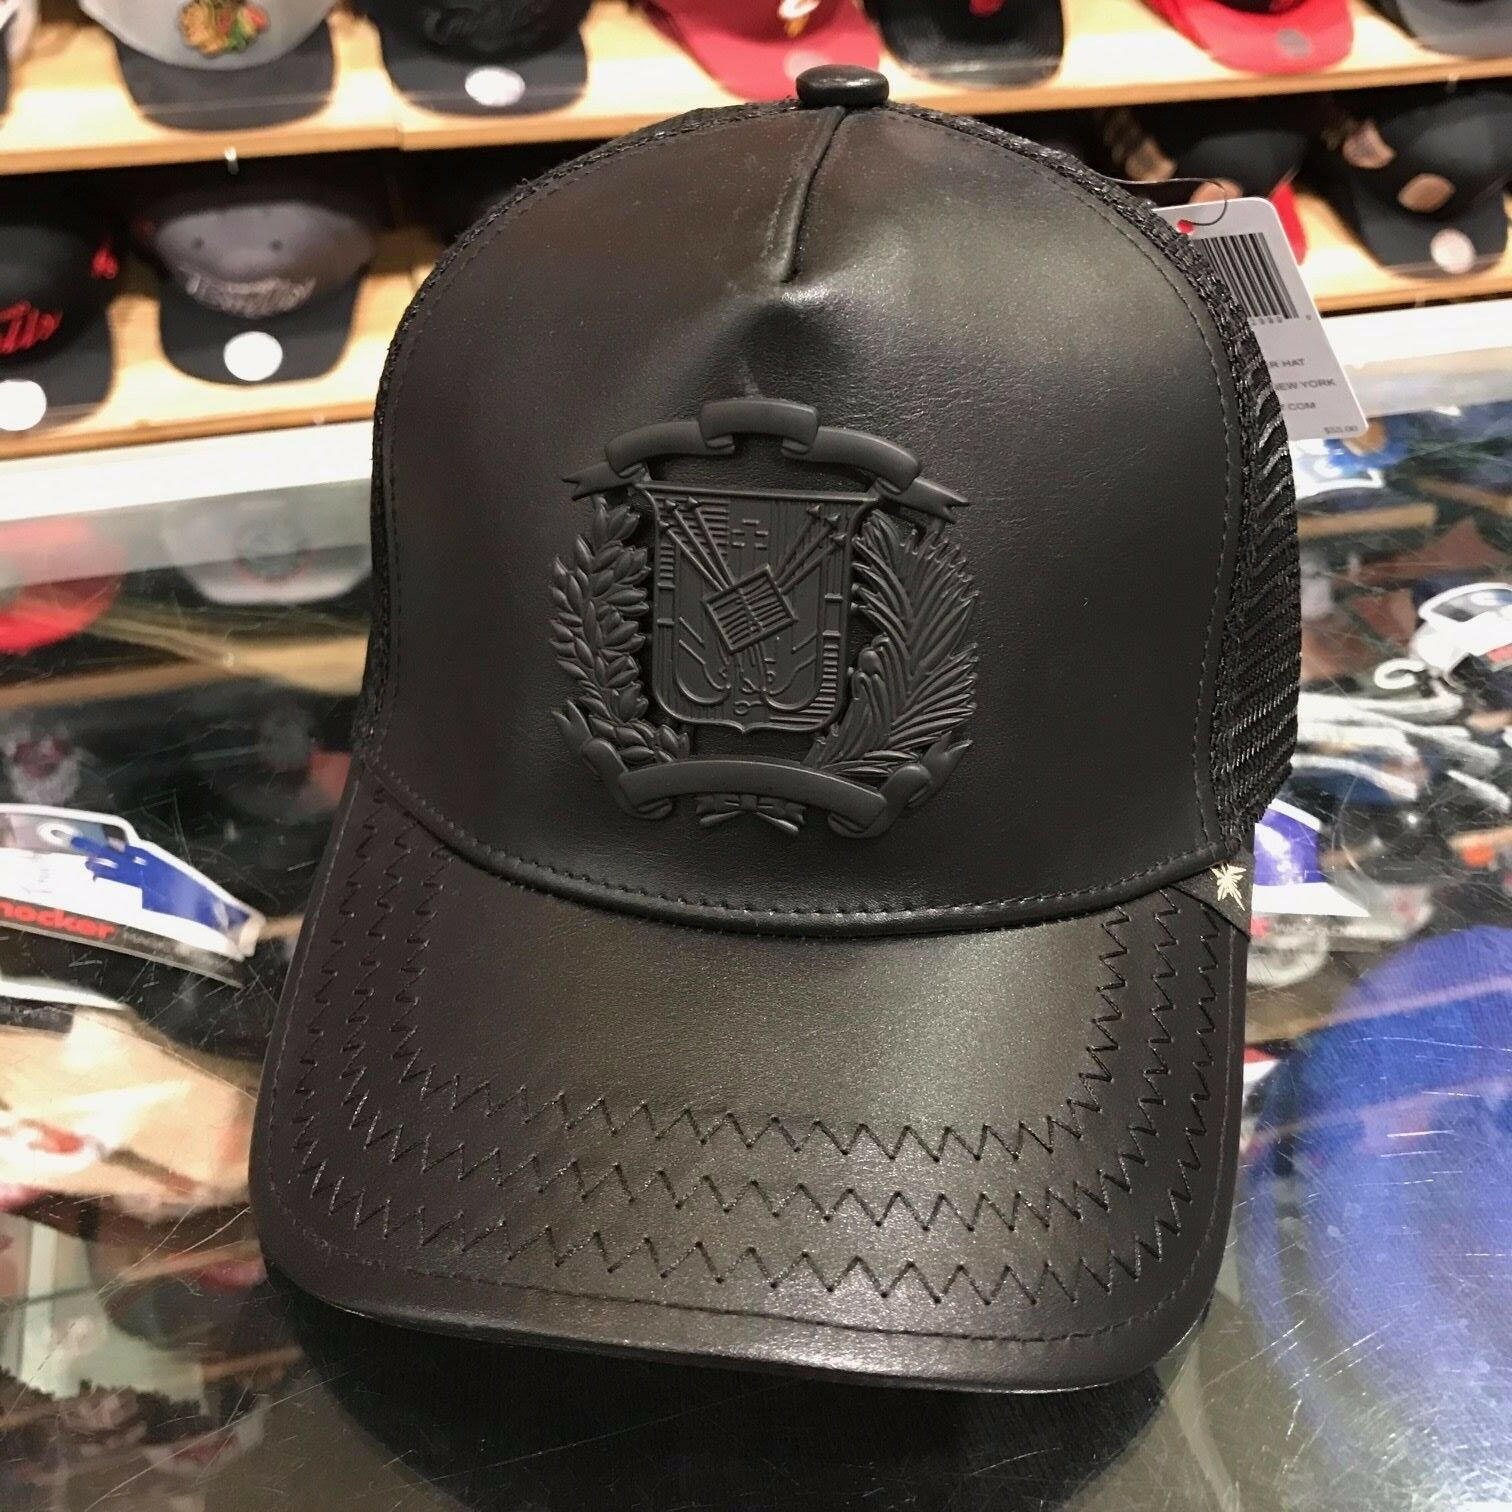 Gold Cap Star Trucker Snapback Hat Cap Gold Black Leather/Black Badge Dominican Republic 8ad4c6